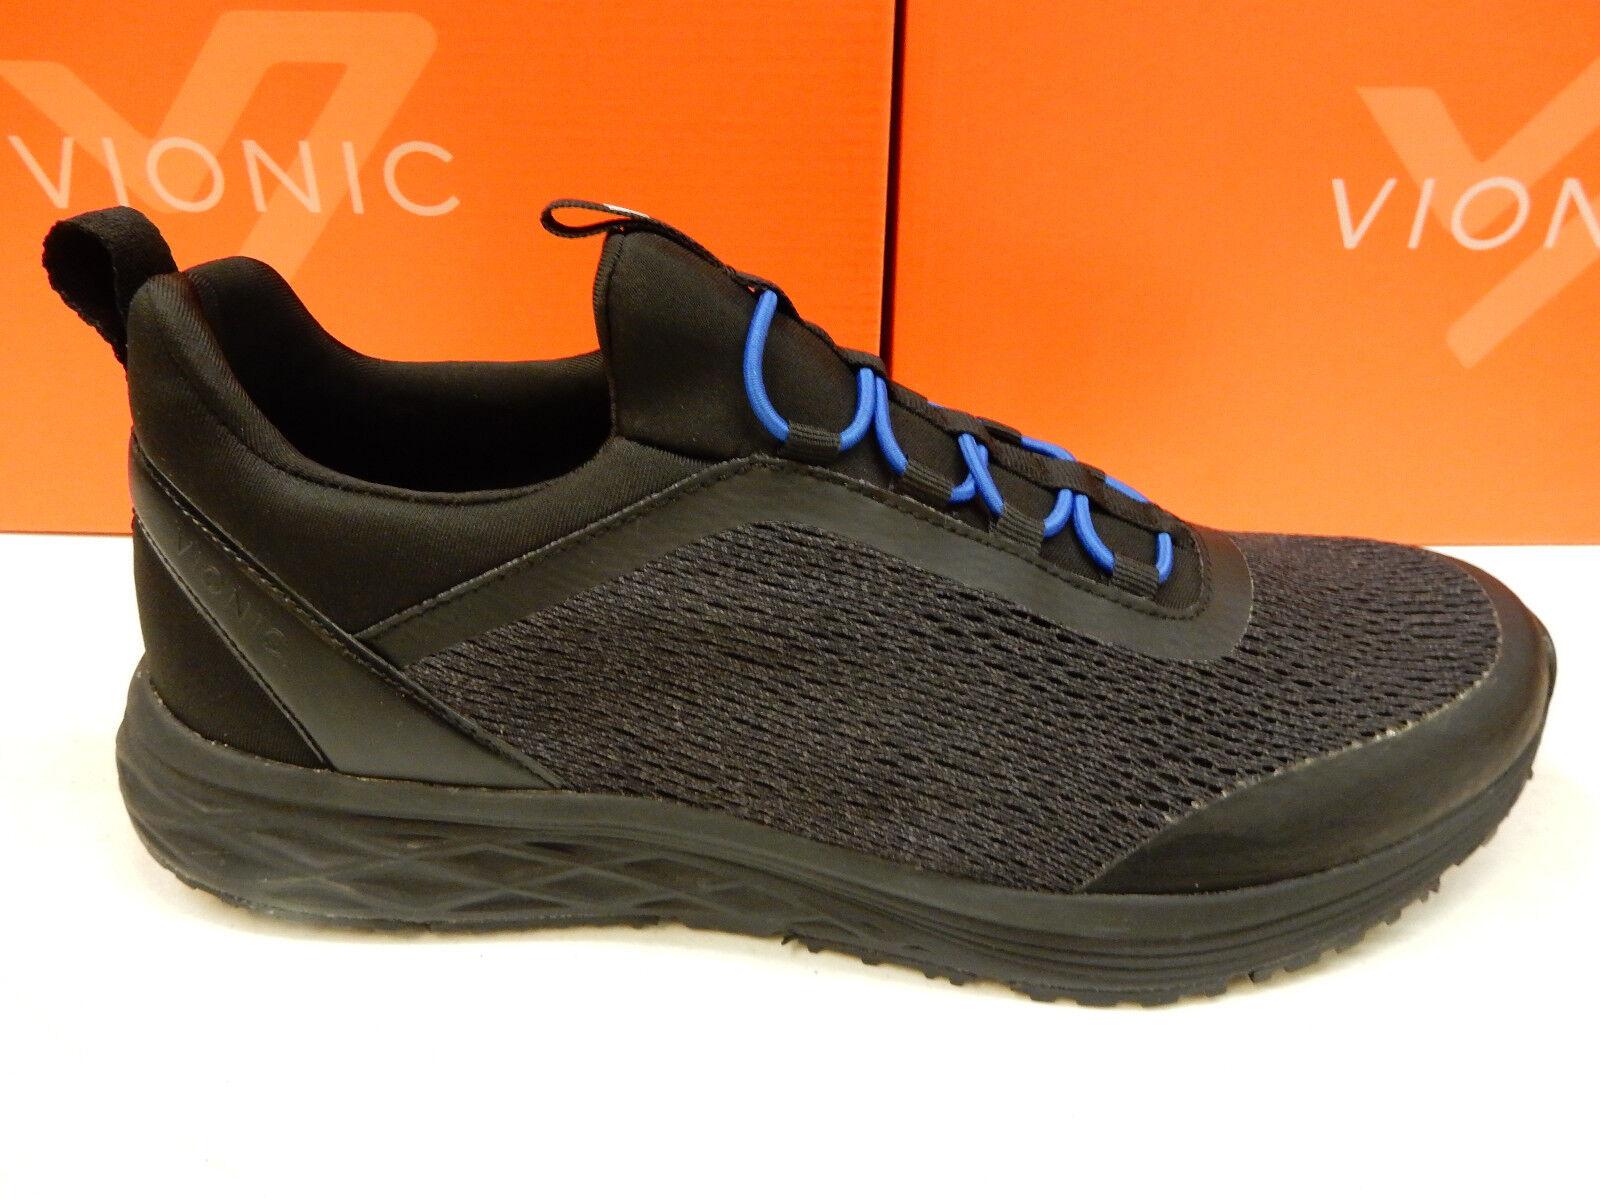 Vionic Mens Morris Active Sneaker Black Size 11.5